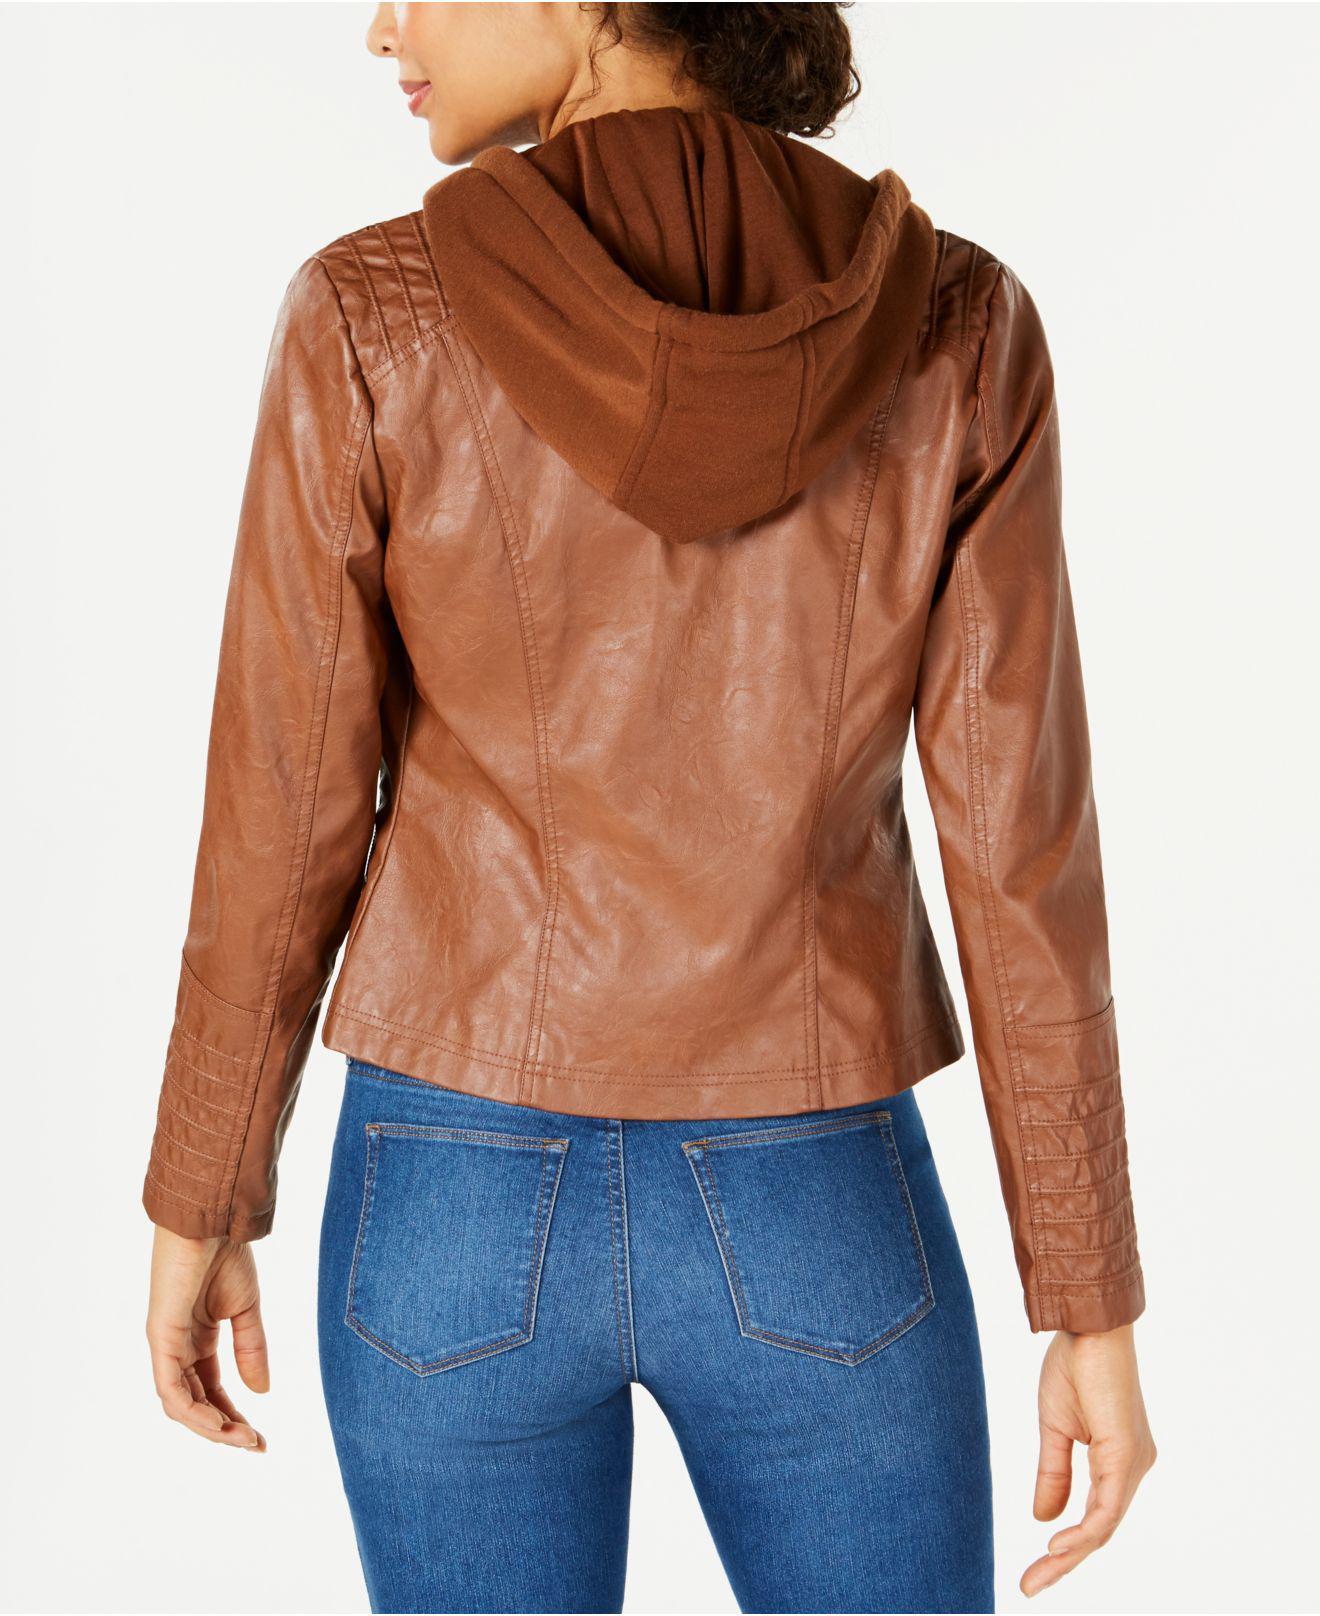 711dba71d6b Lyst - Maralyn   Me Juniors  Hooded Faux-leather Moto Jacket